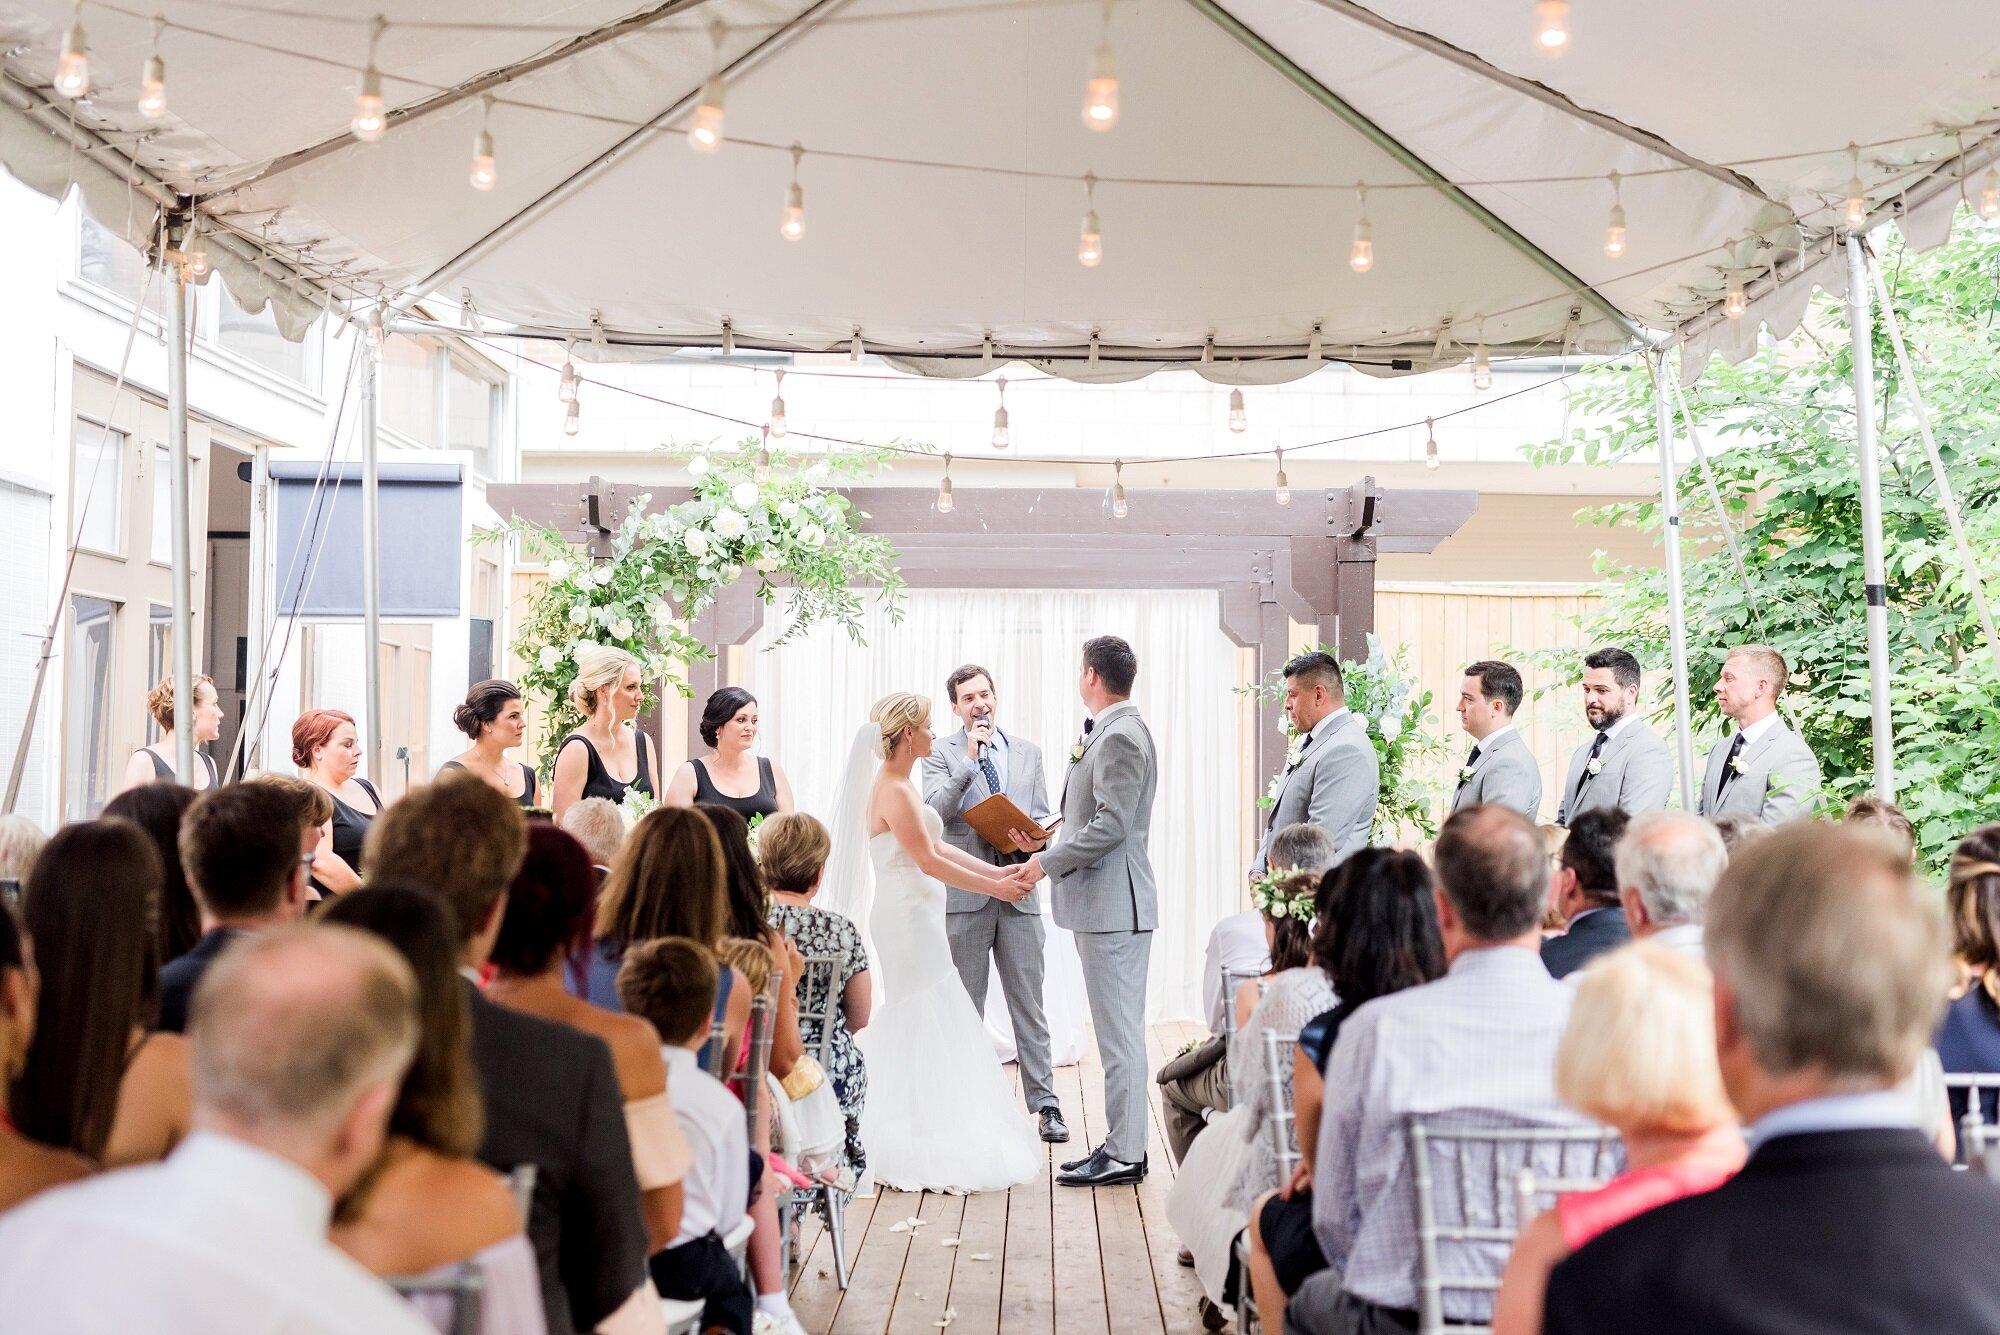 berkeley-field-house-wedding-kj-and-co-19.jpg